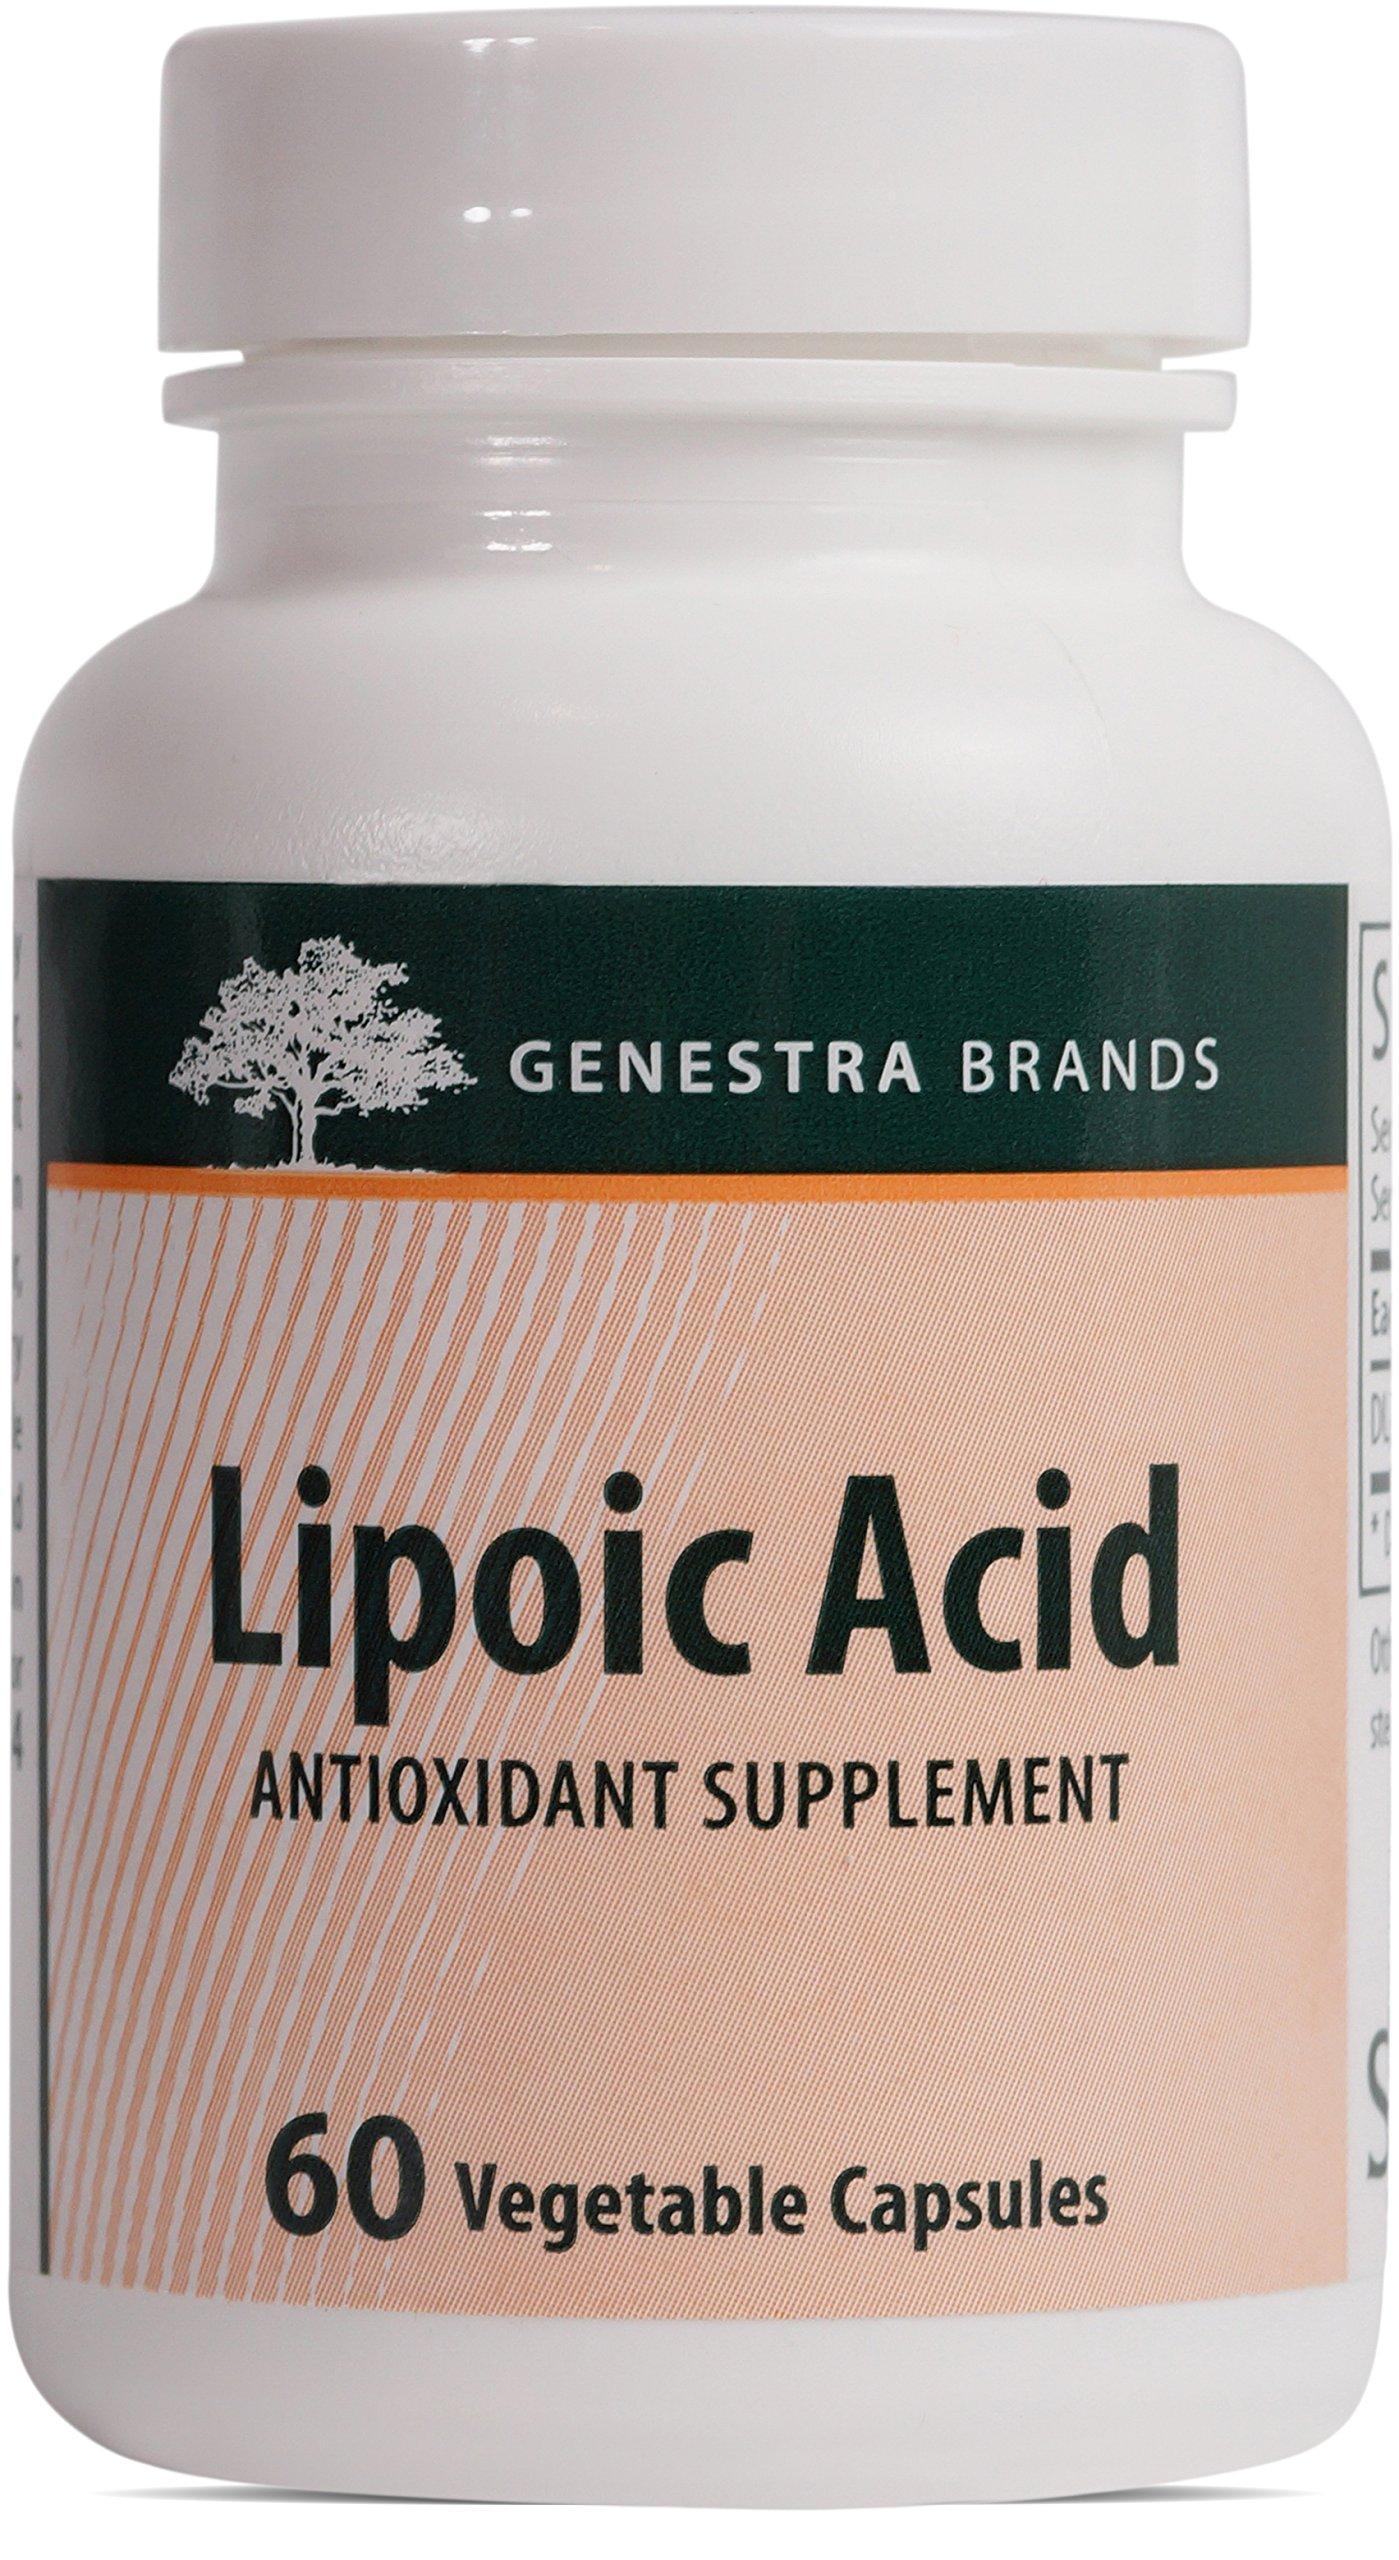 Genestra Brands - Lipoic Acid - Vegan Alpha Lipoic Acid Formula - 60 Vegetable Capsules